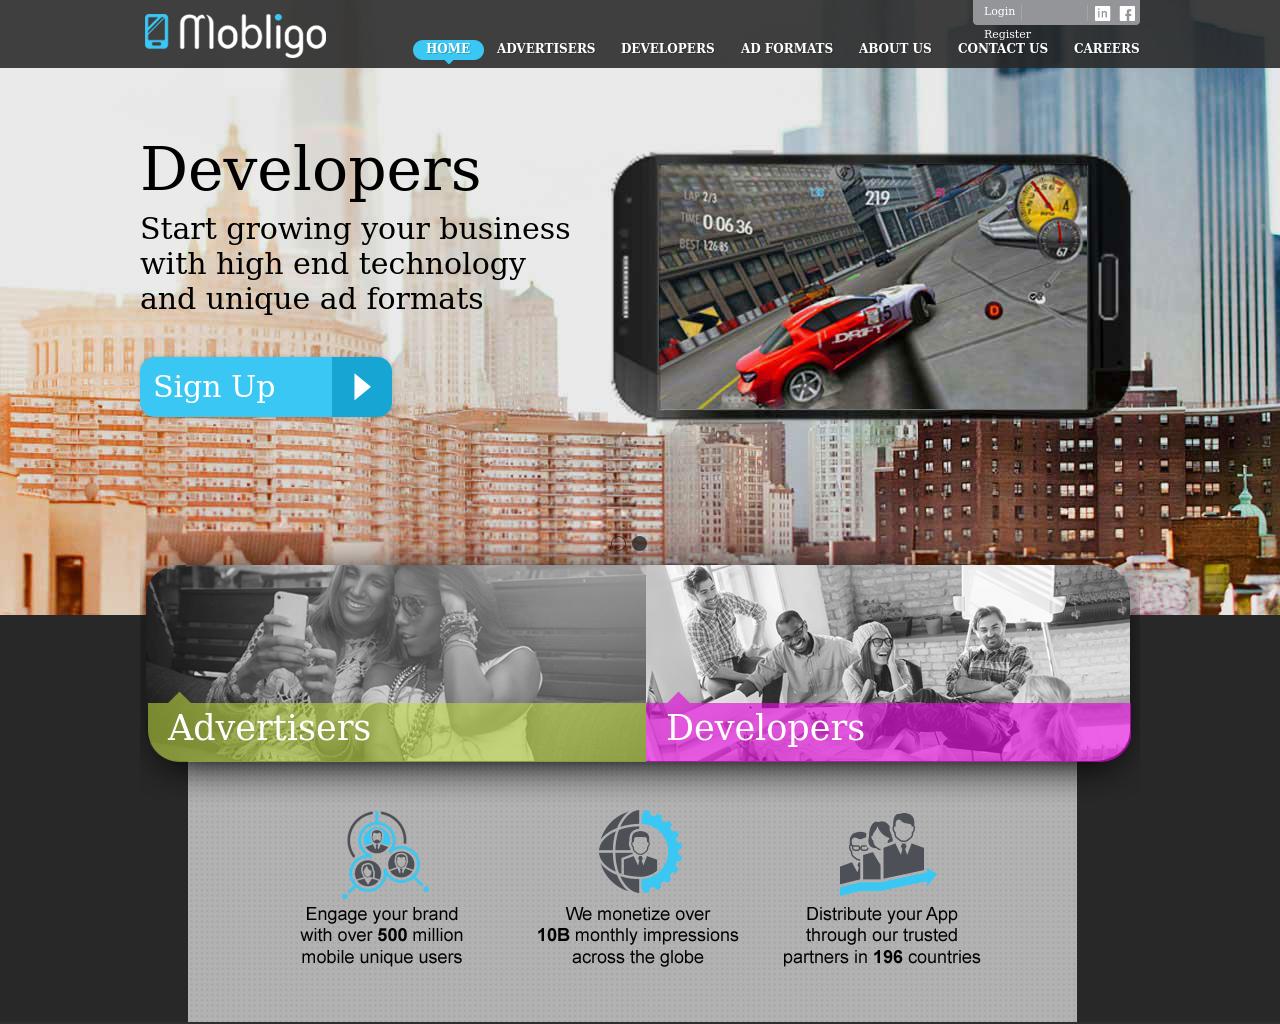 Mobligo-Advertising-Reviews-Pricing